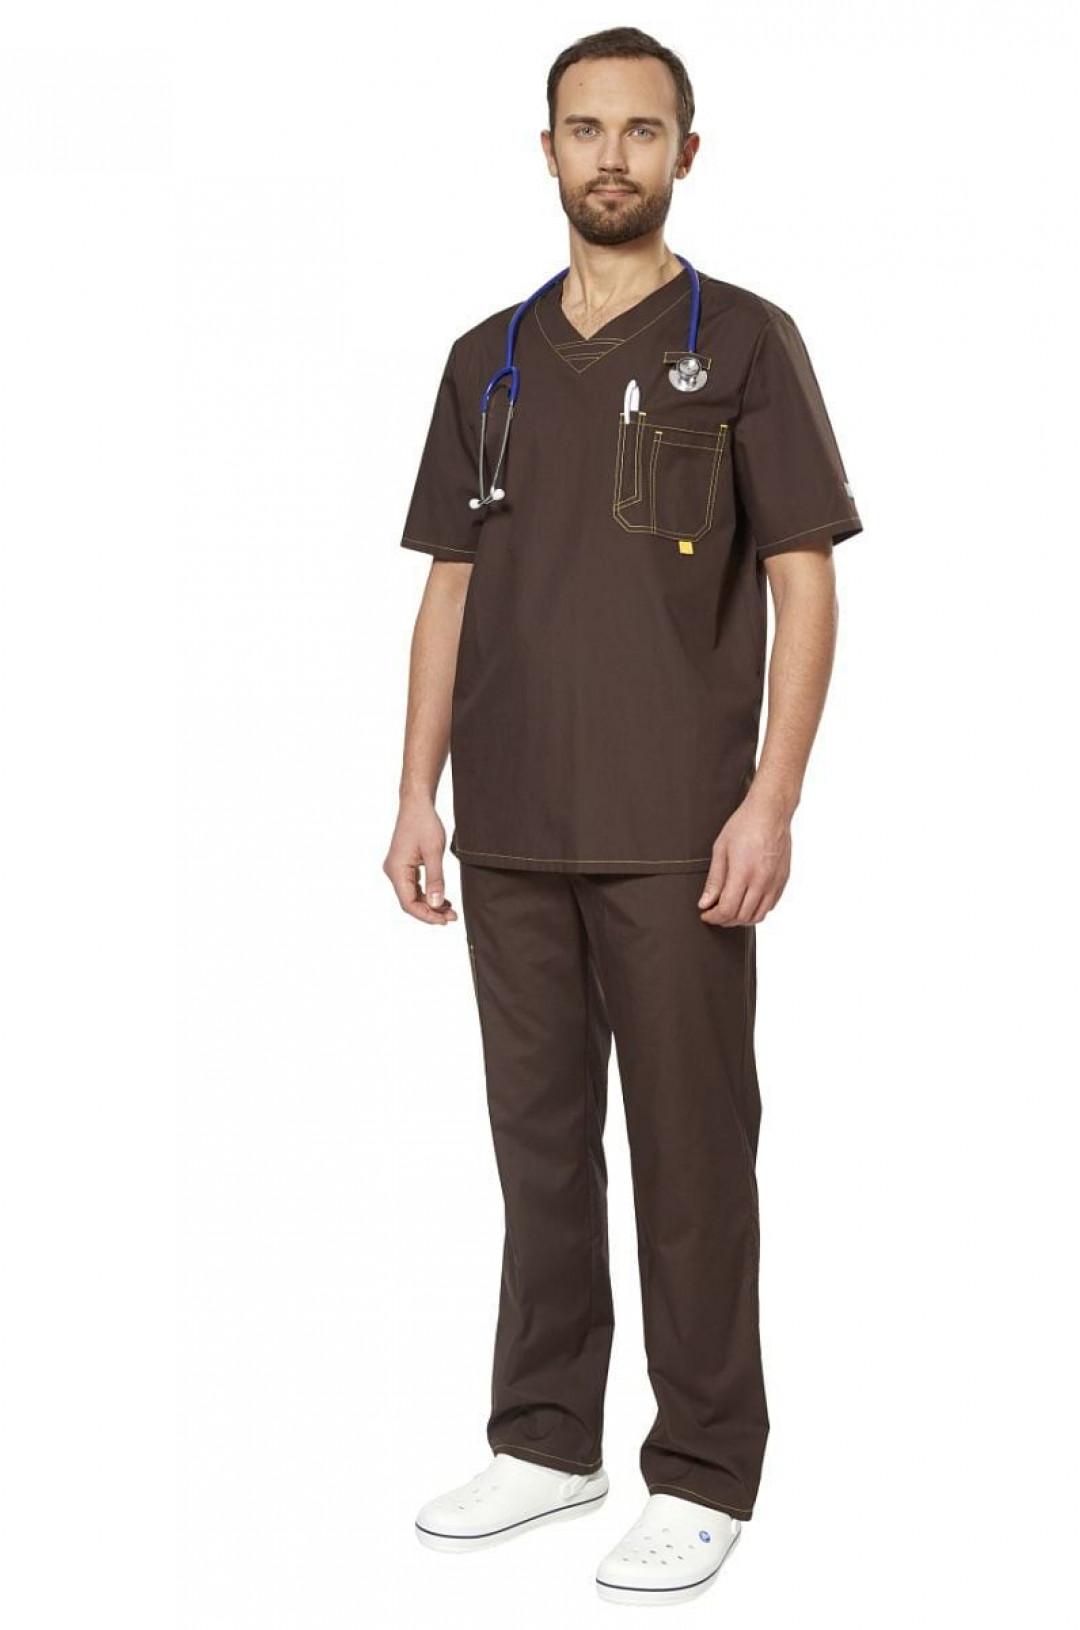 Костюм медицинский мужской Аура (коричневый, тиси)